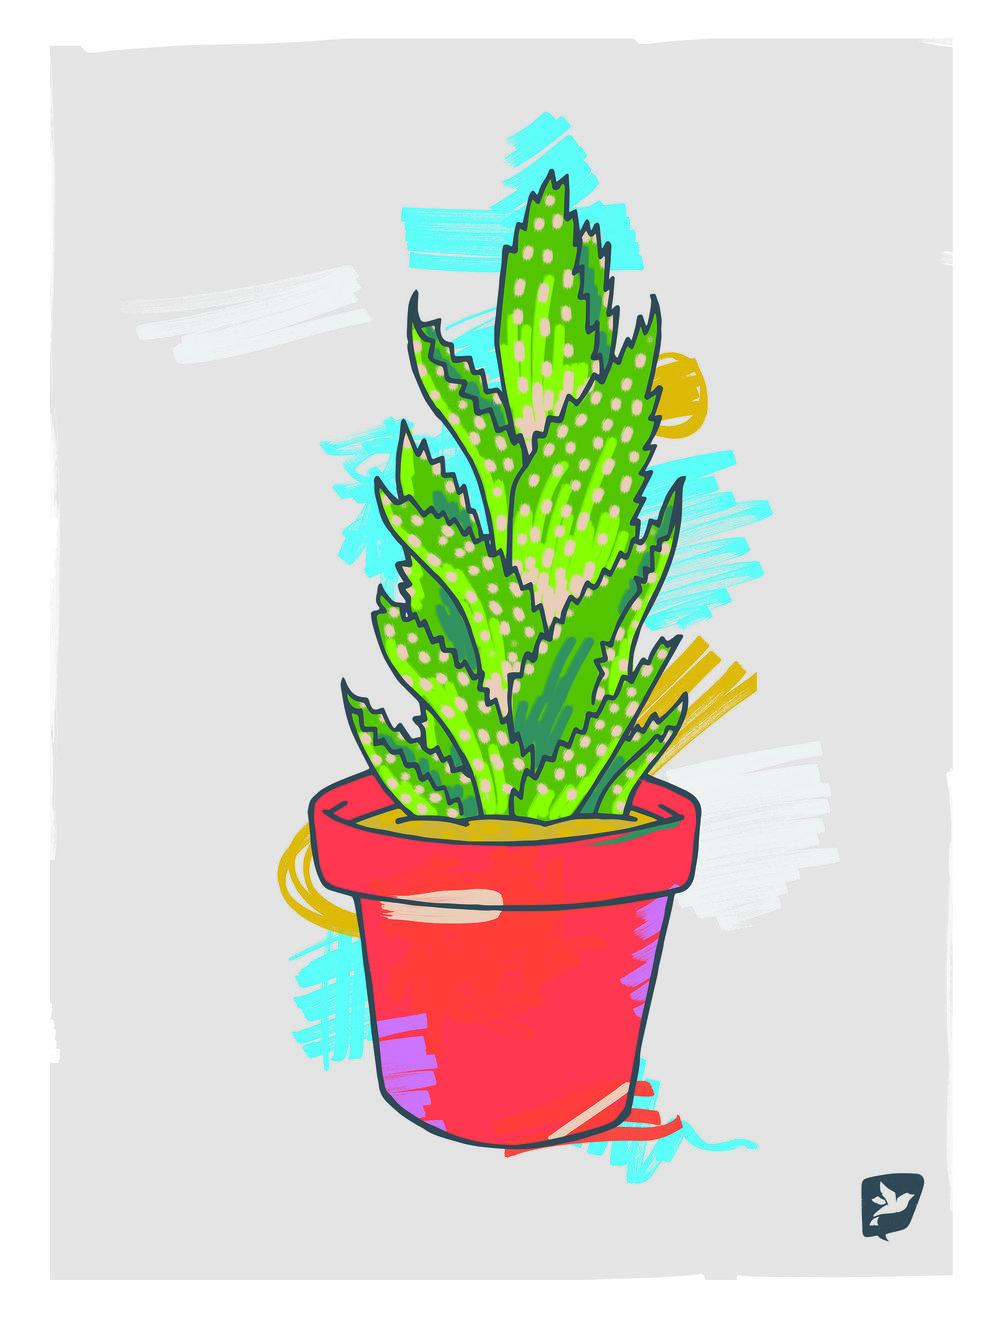 Poster_template_0002_cactus.jpg